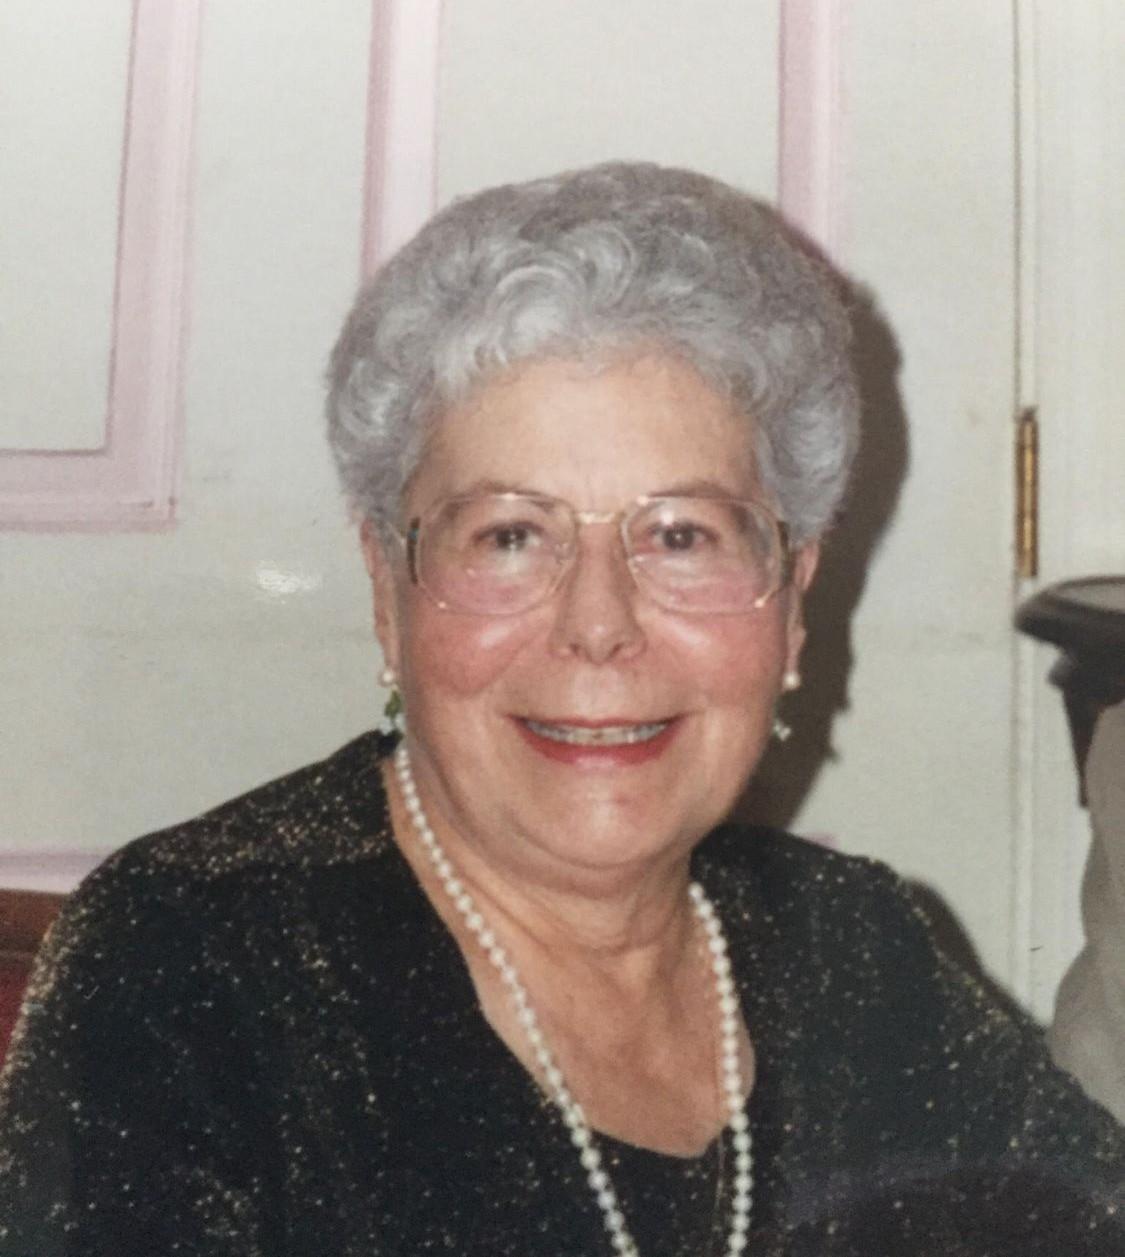 Angela Jean Towle